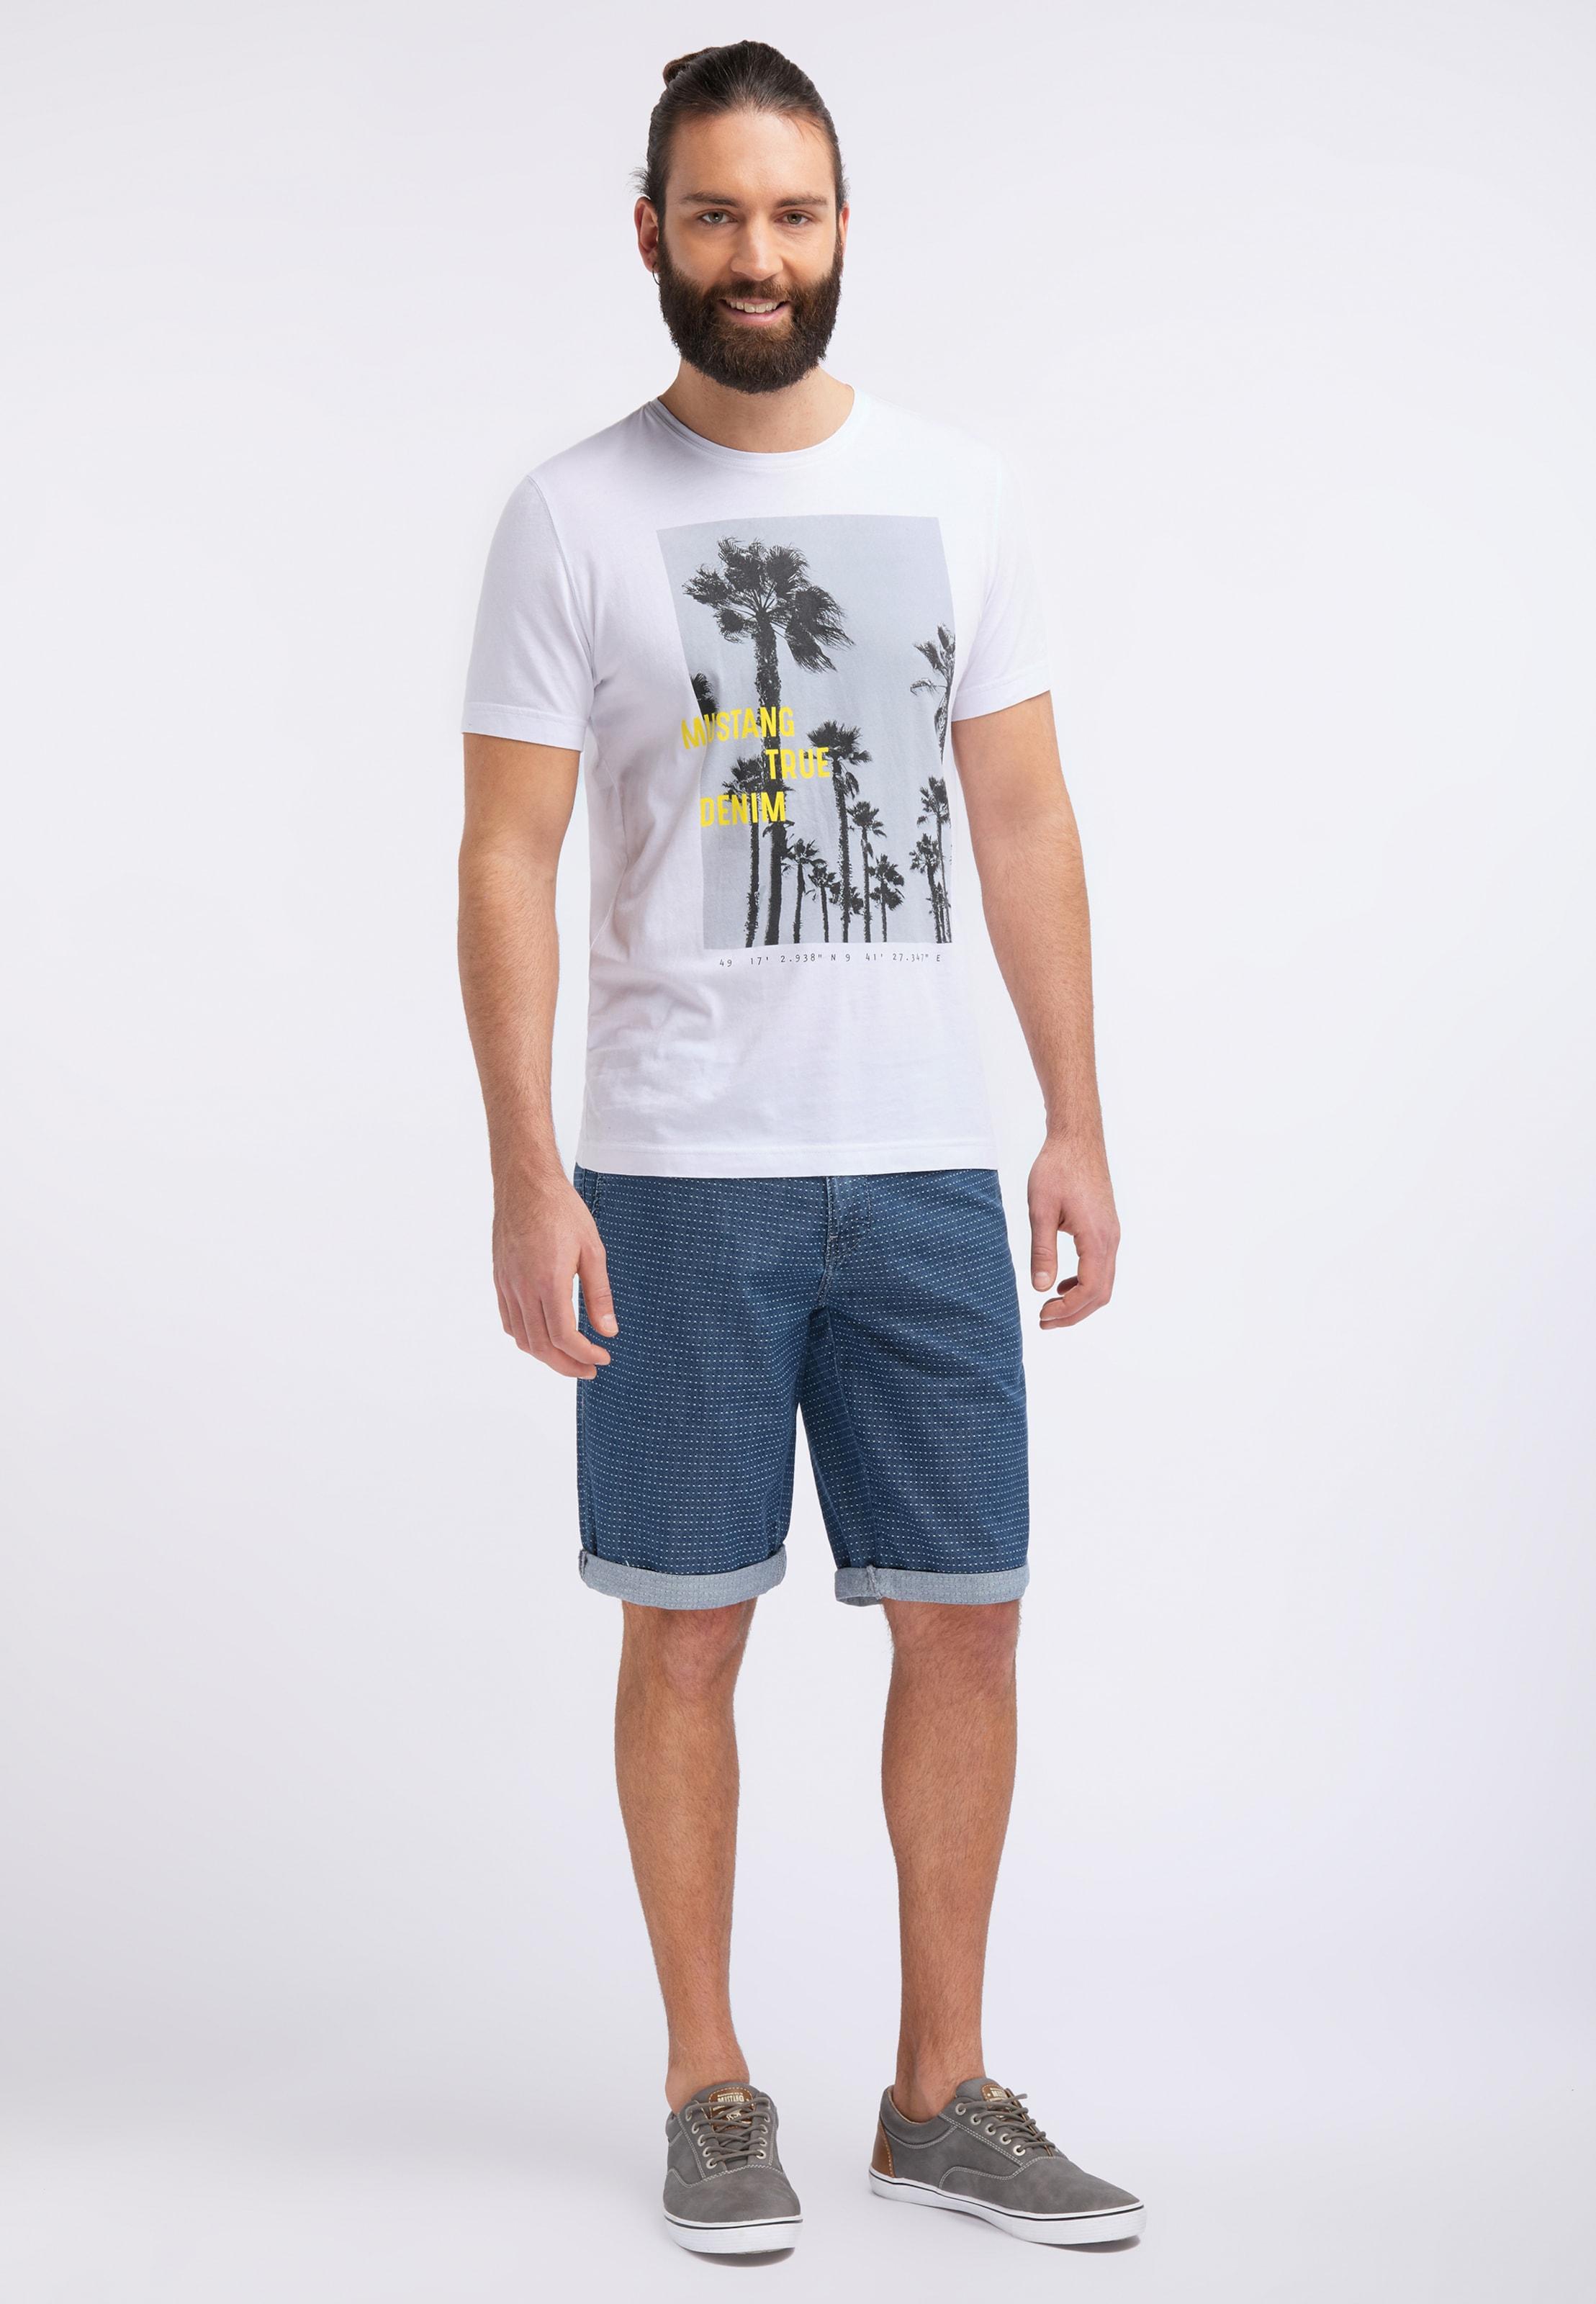 shirt GelbWeiß Mustang In T 'photoprint Shirt' Nn0vm8wO